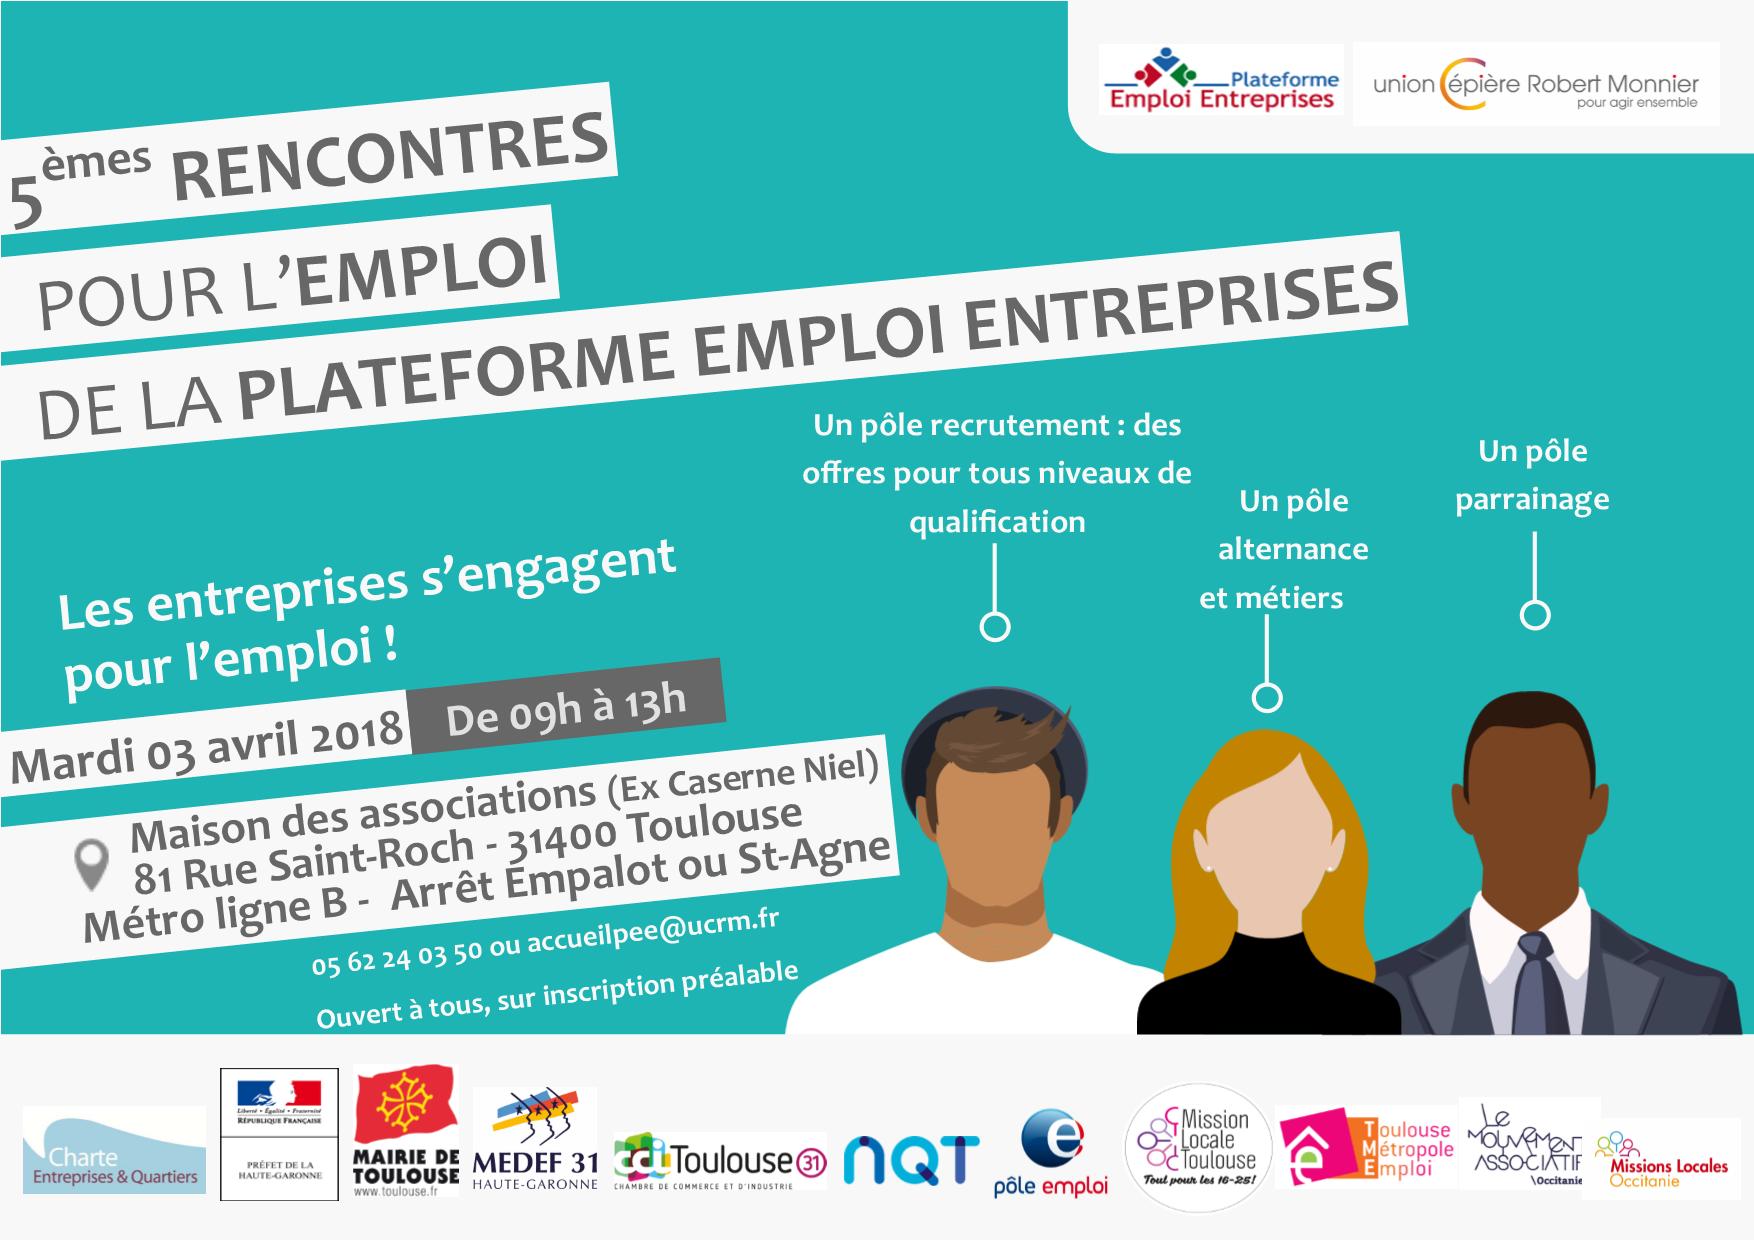 flyer_rencontre_emploi_1.png